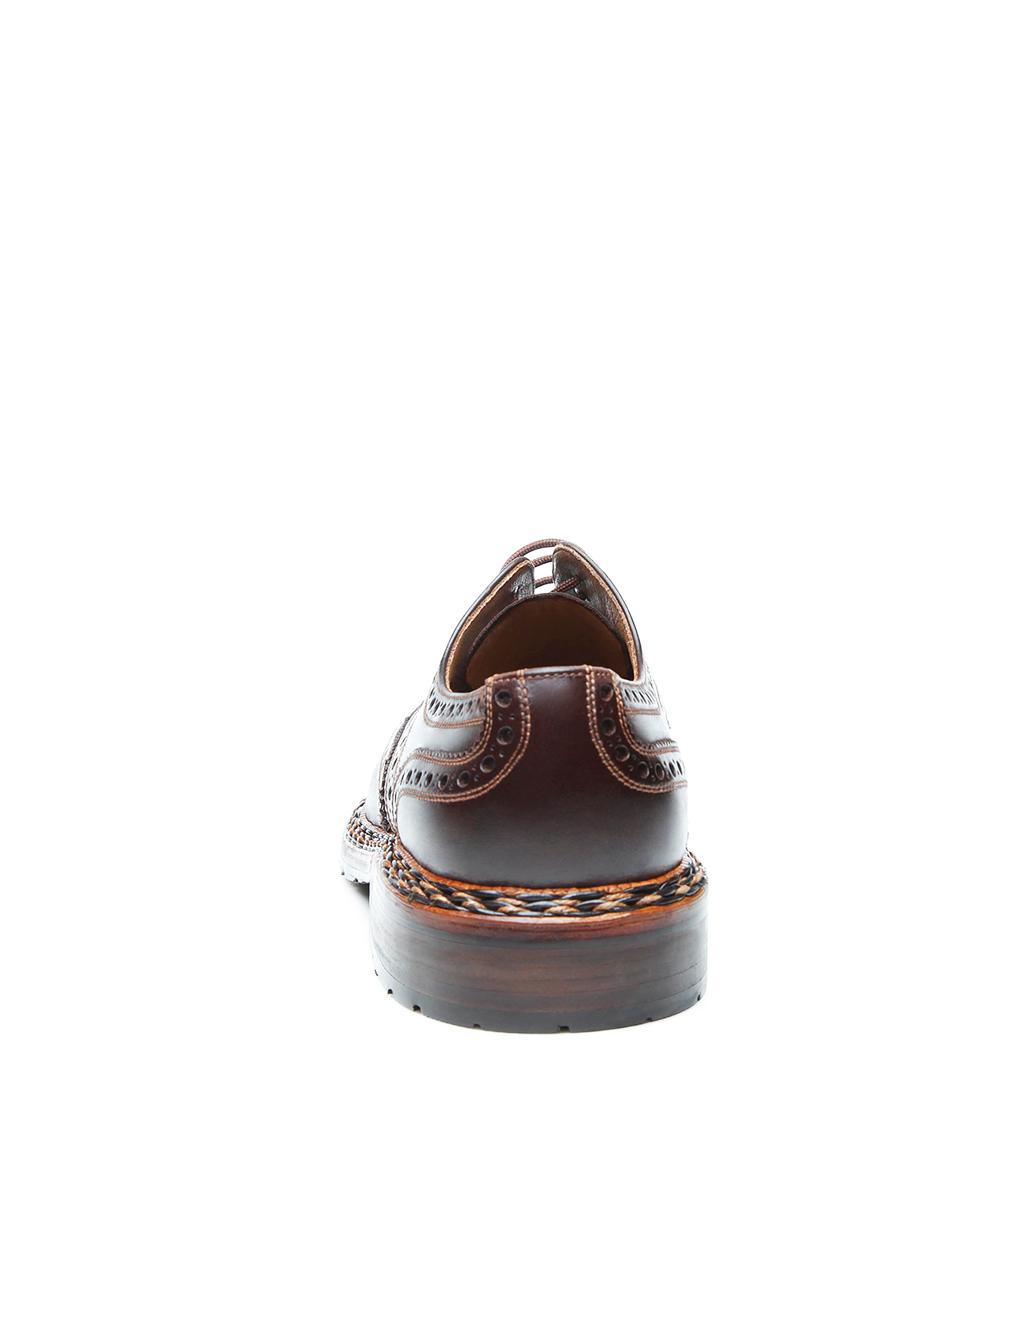 Original Budapester Mens Shoe In Mocha D Island Shoes Slip On British Comfort Leather Dark Brown Discontinued Model